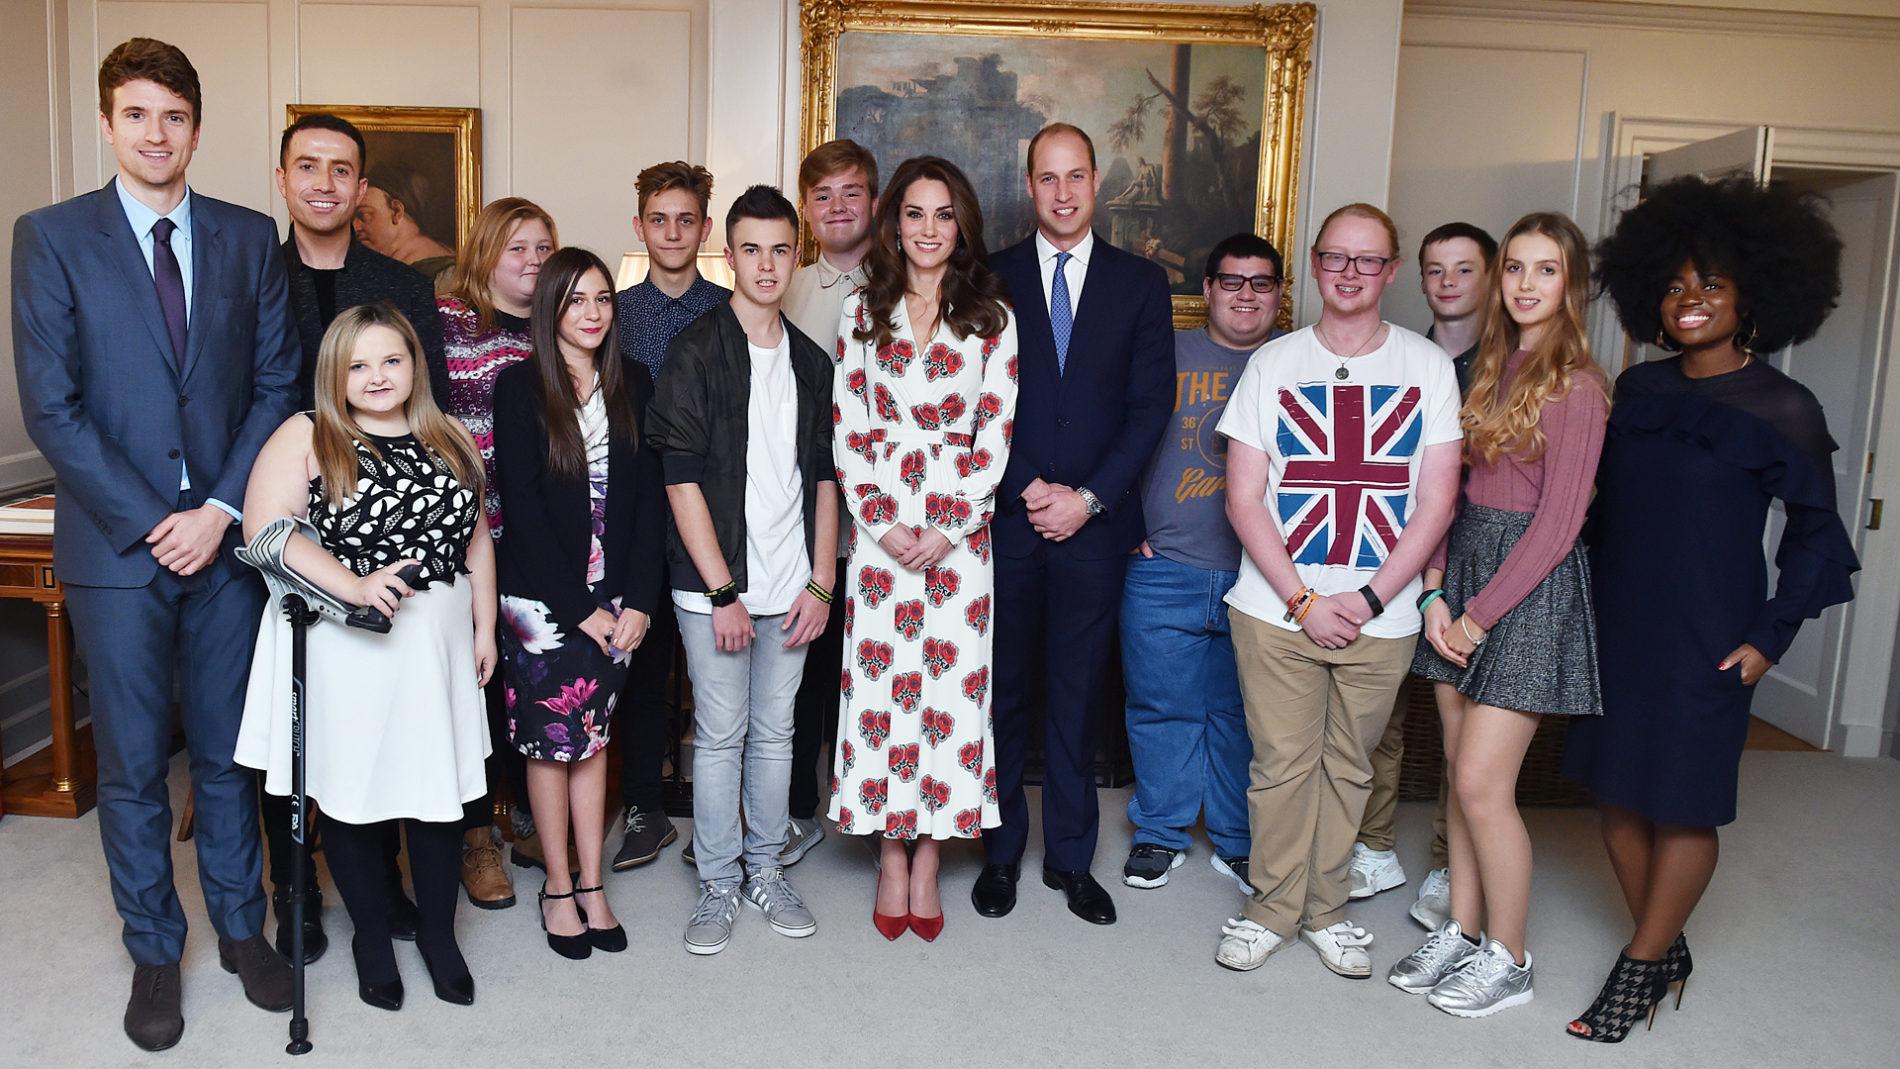 BBC Radio 1 Teen Heroes at Kensington Palace with Clara Amfo, Greg James, Nick Grimshaw, HRH Duke and Duchess of Cambridge, 2016. Loftus Media Photographer: Sarah Jeynes. © BBC.